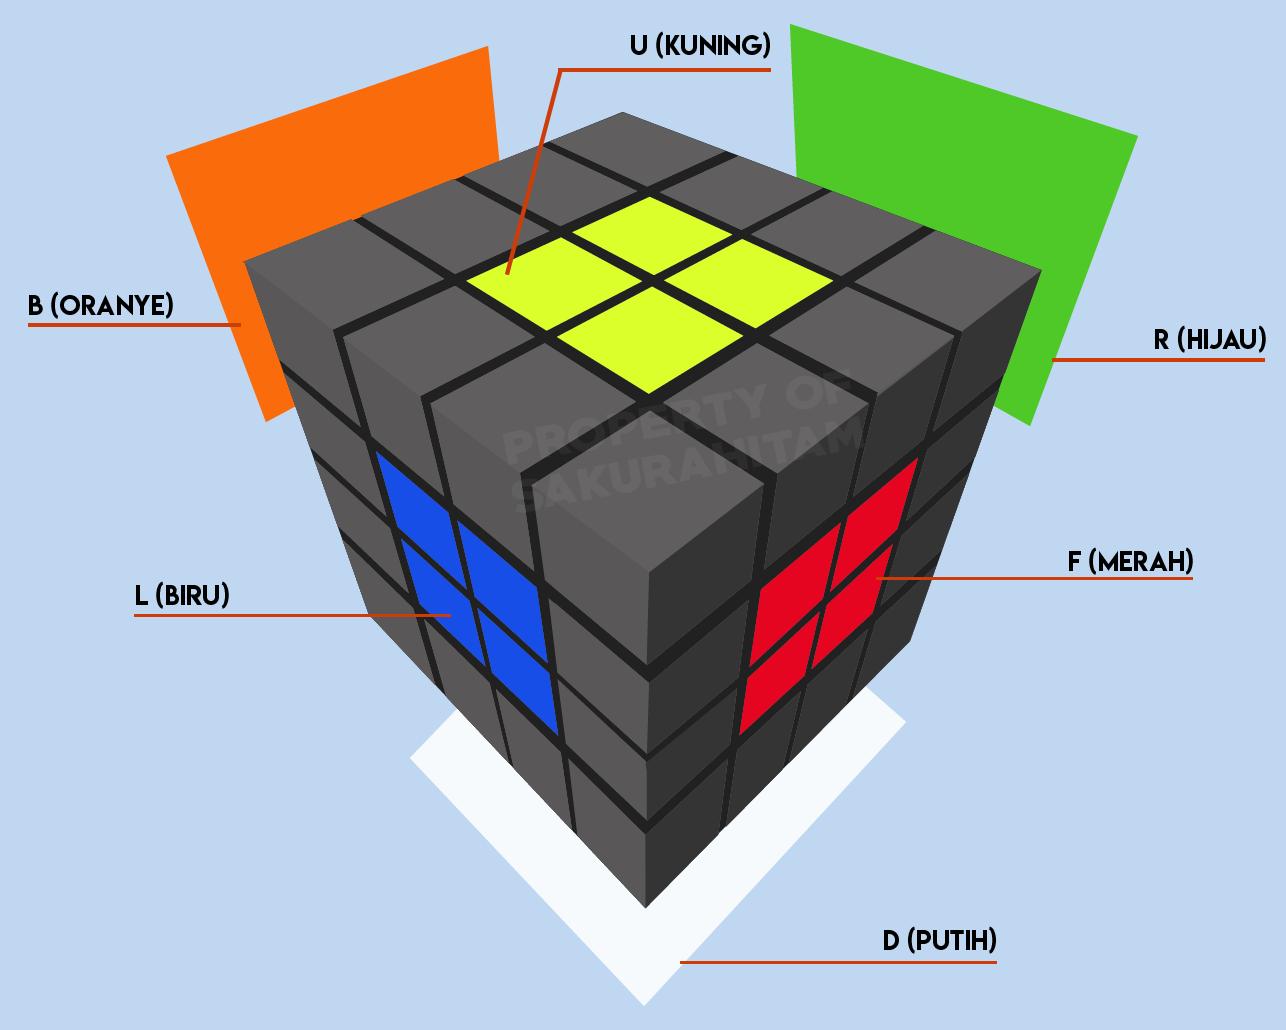 Cara Menyelesaikan Rubik 4x4 Dengan Mudah Sakurahitam Nokia Xl Oranye Tutorial